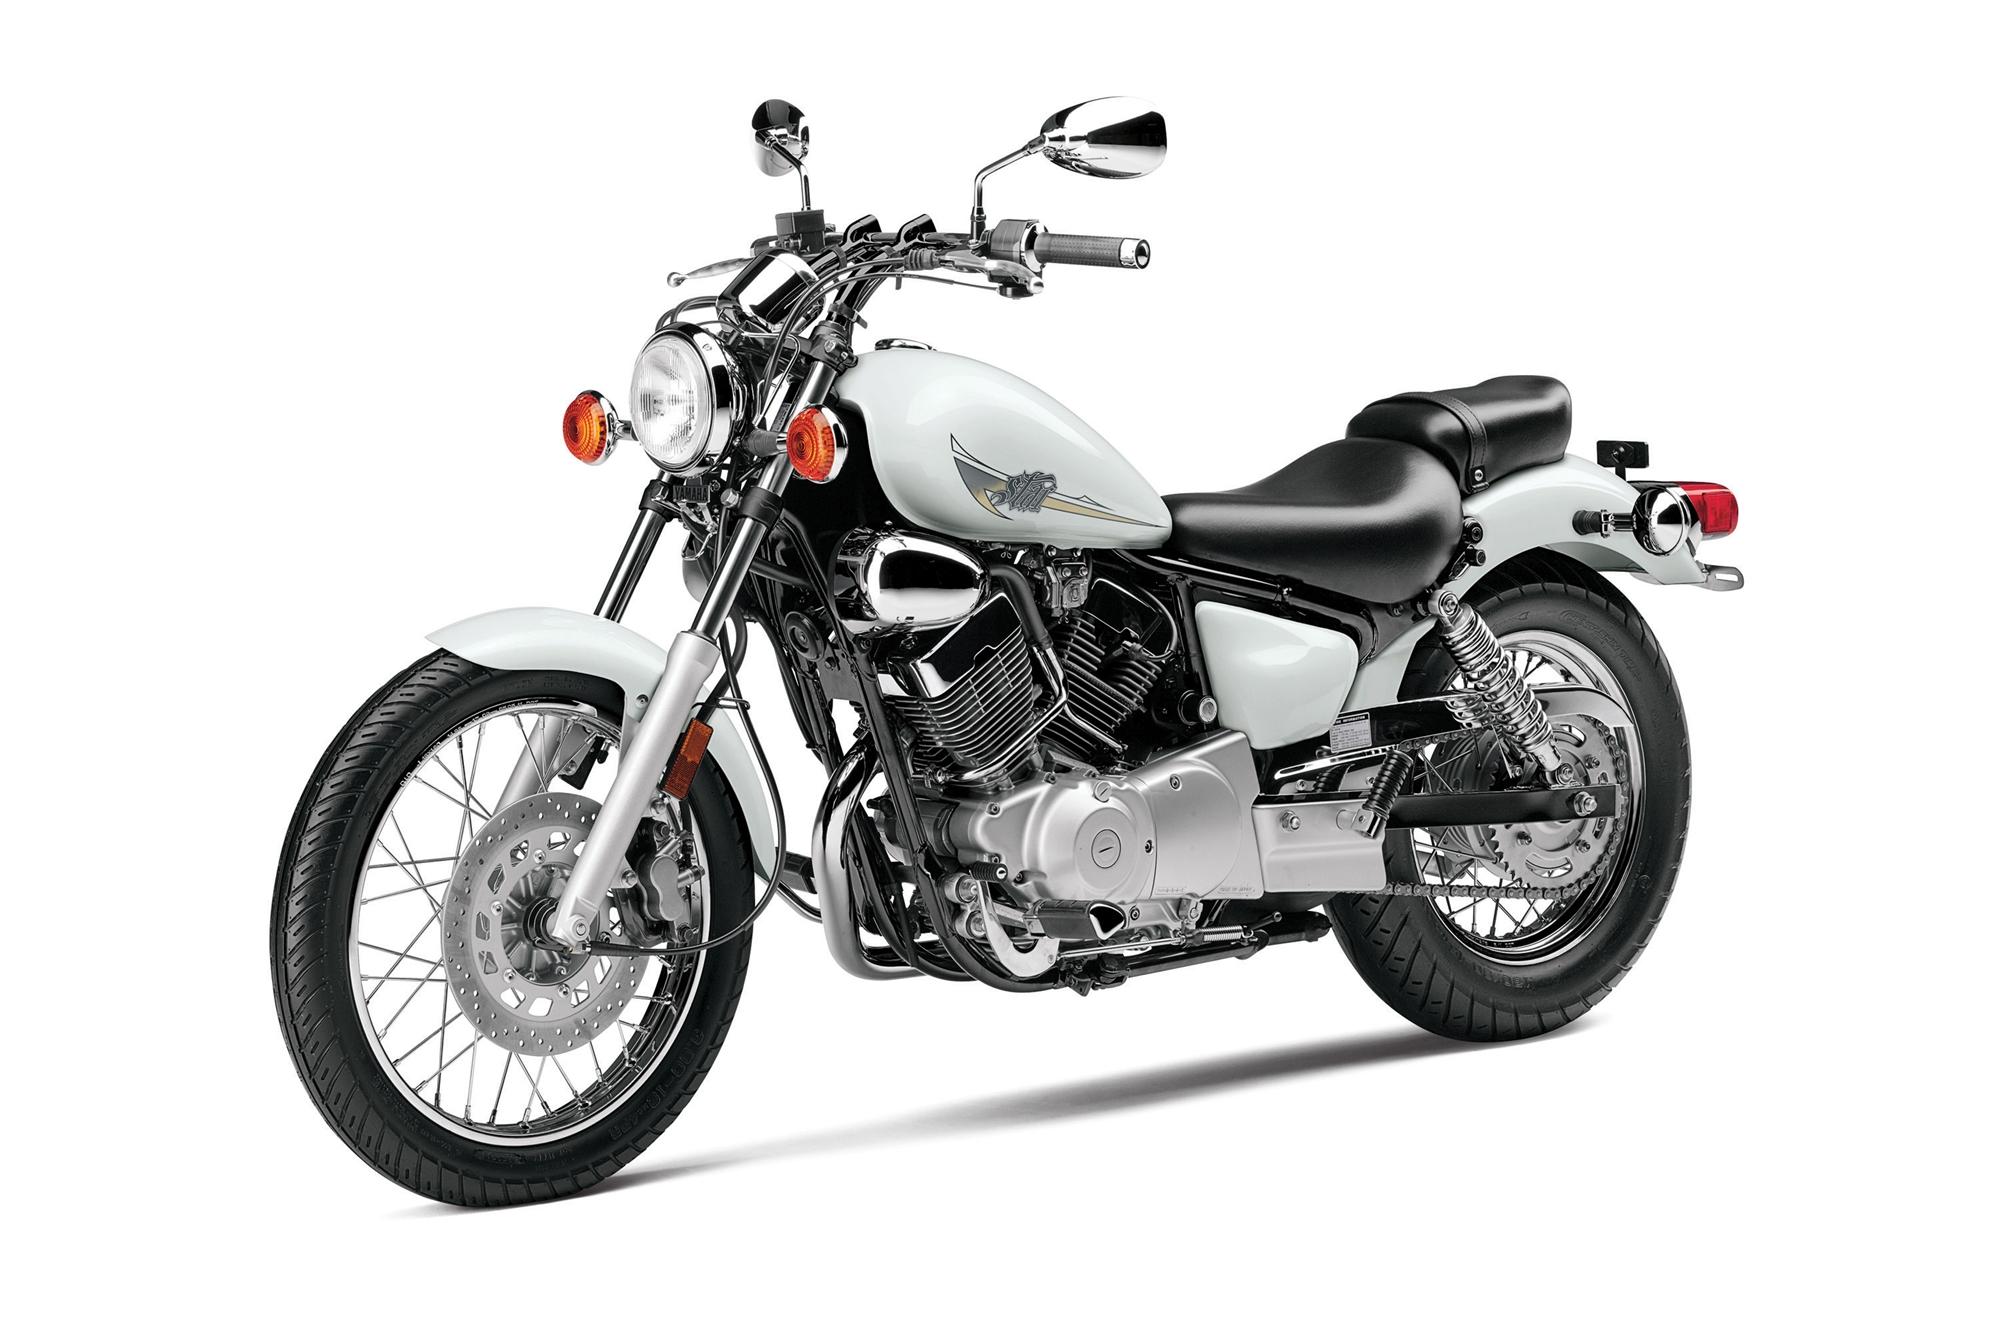 Yamaha XV250 تأجير دراجة نارية وسكوتر في California (الولايات المتحدة)